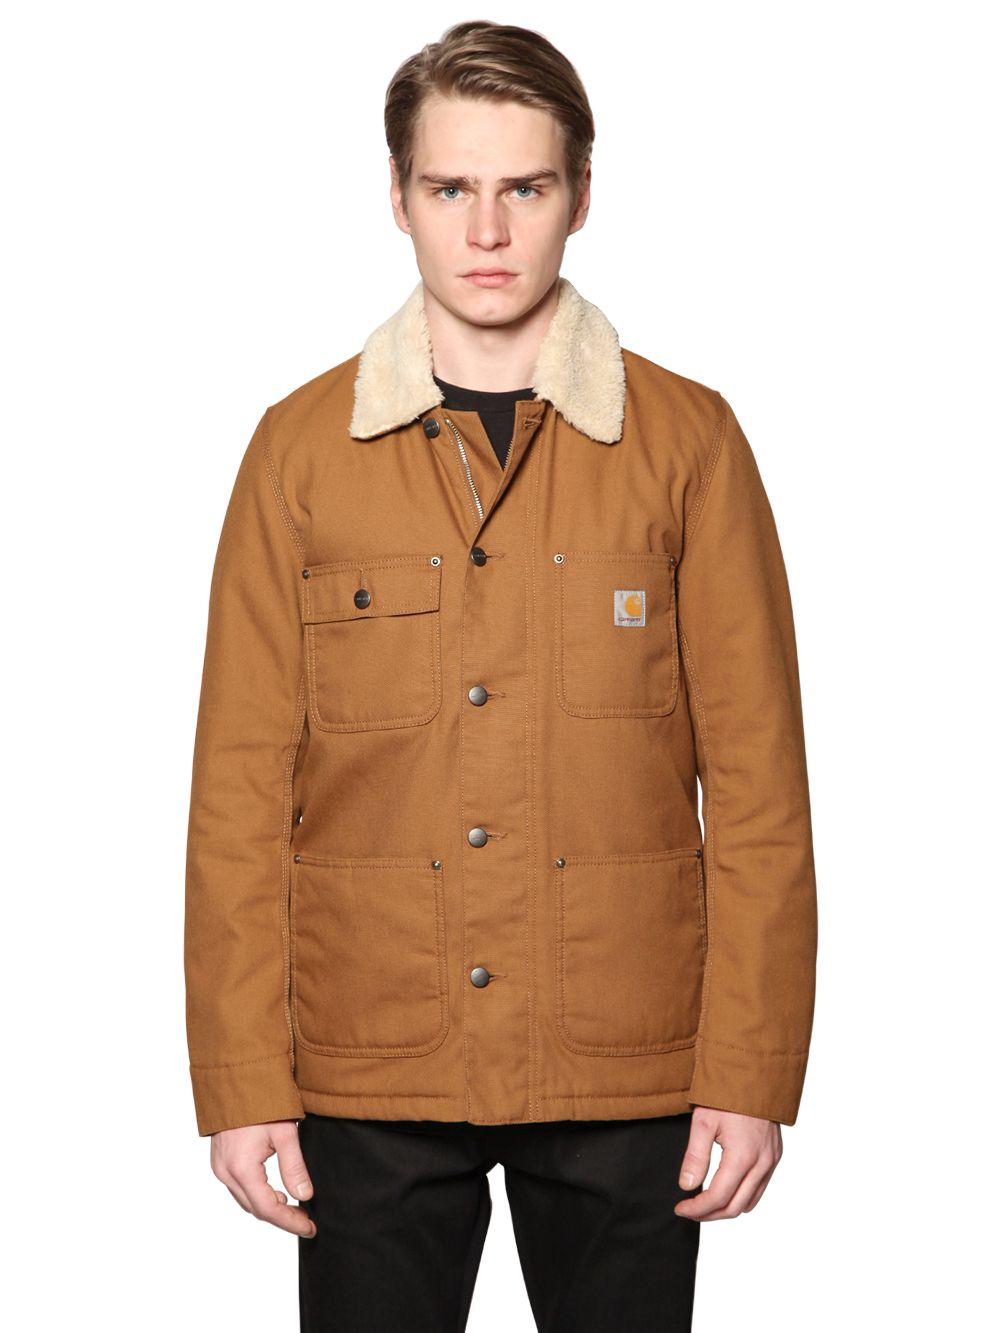 Lyst Carhartt Phoenix Techno Amp Cotton Canvas Jacket In